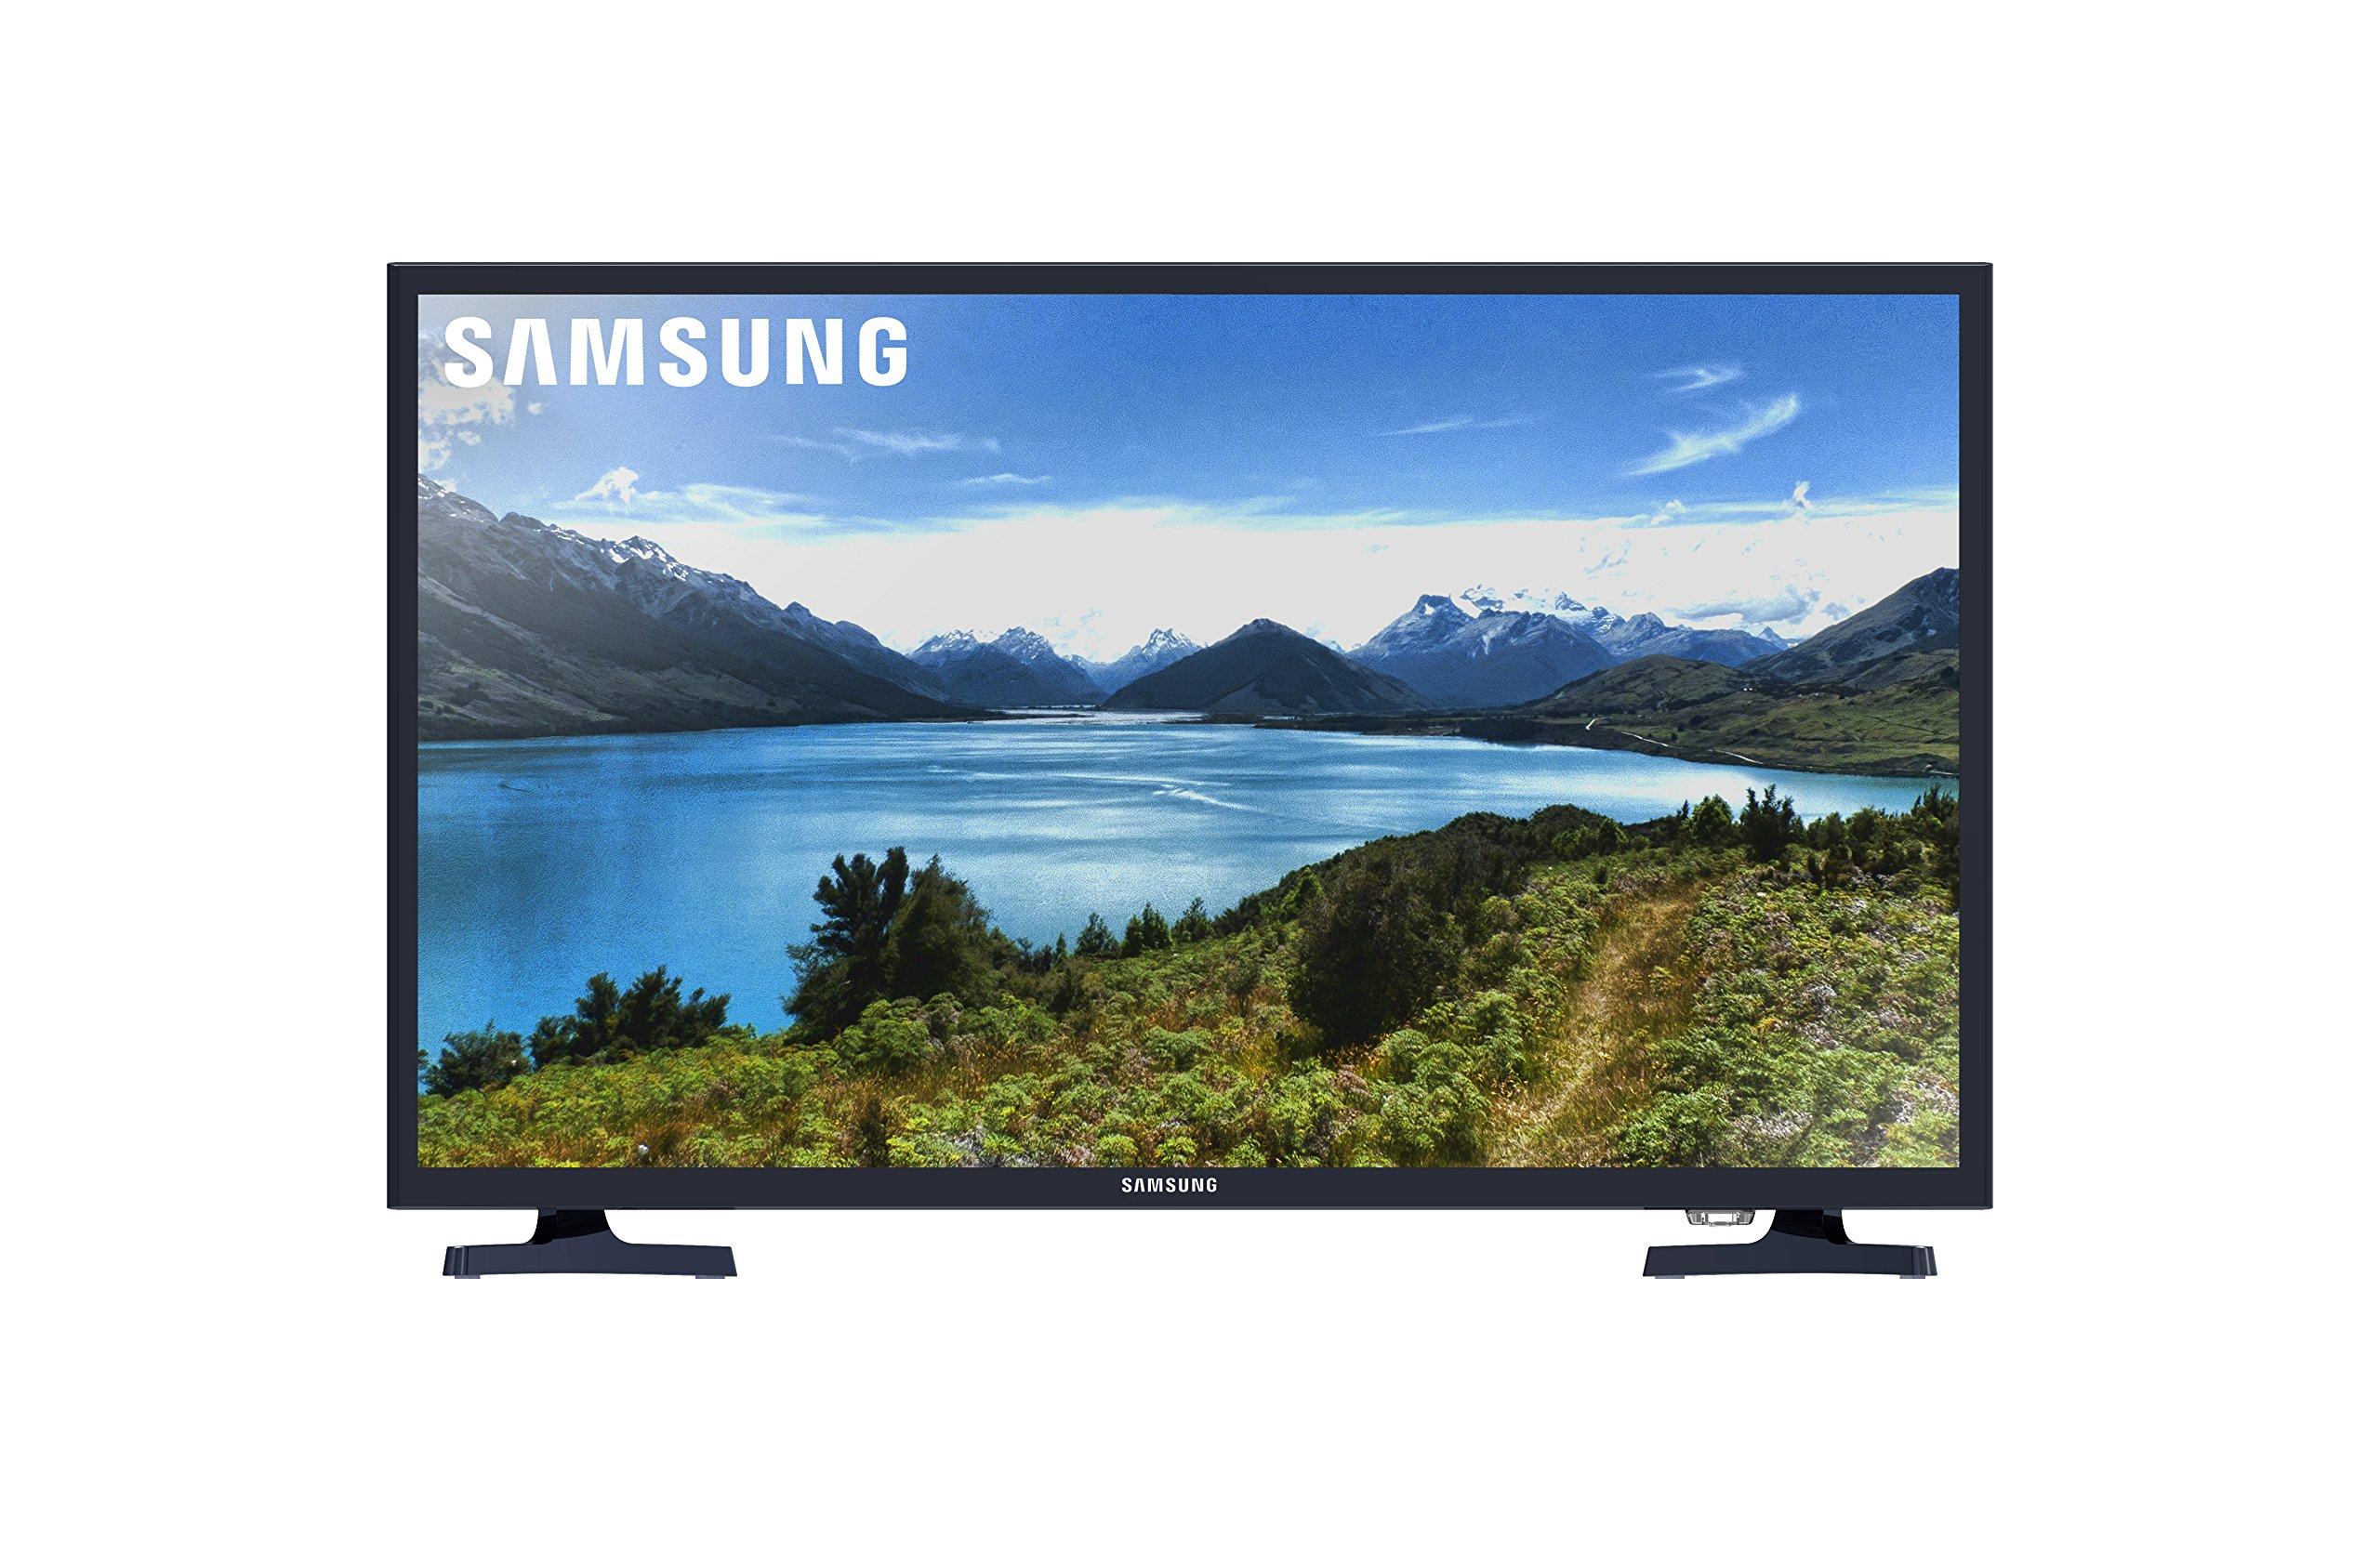 Samsung Electronics UN32J4001  32-Inch 720p LED TV (2017 Model) by Samsung